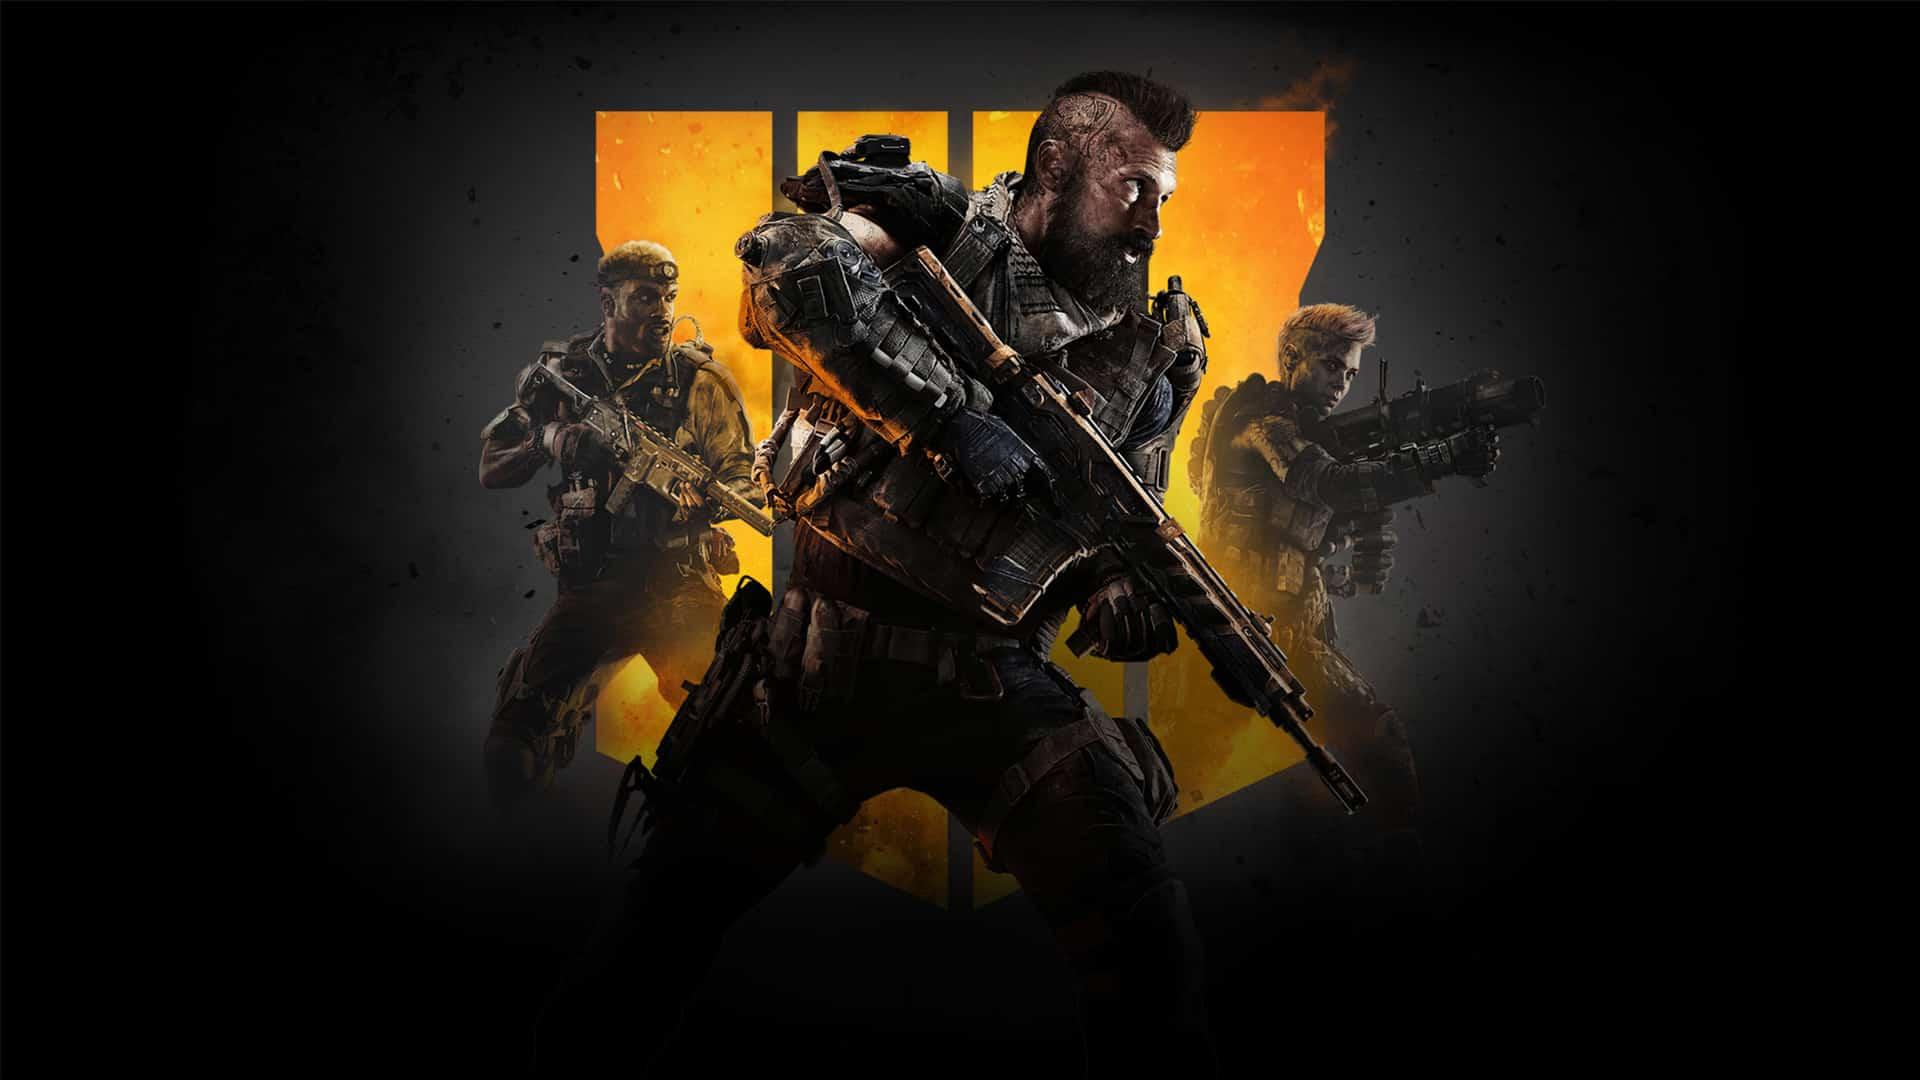 beta verzia hry Call of Duty: Black Ops 4